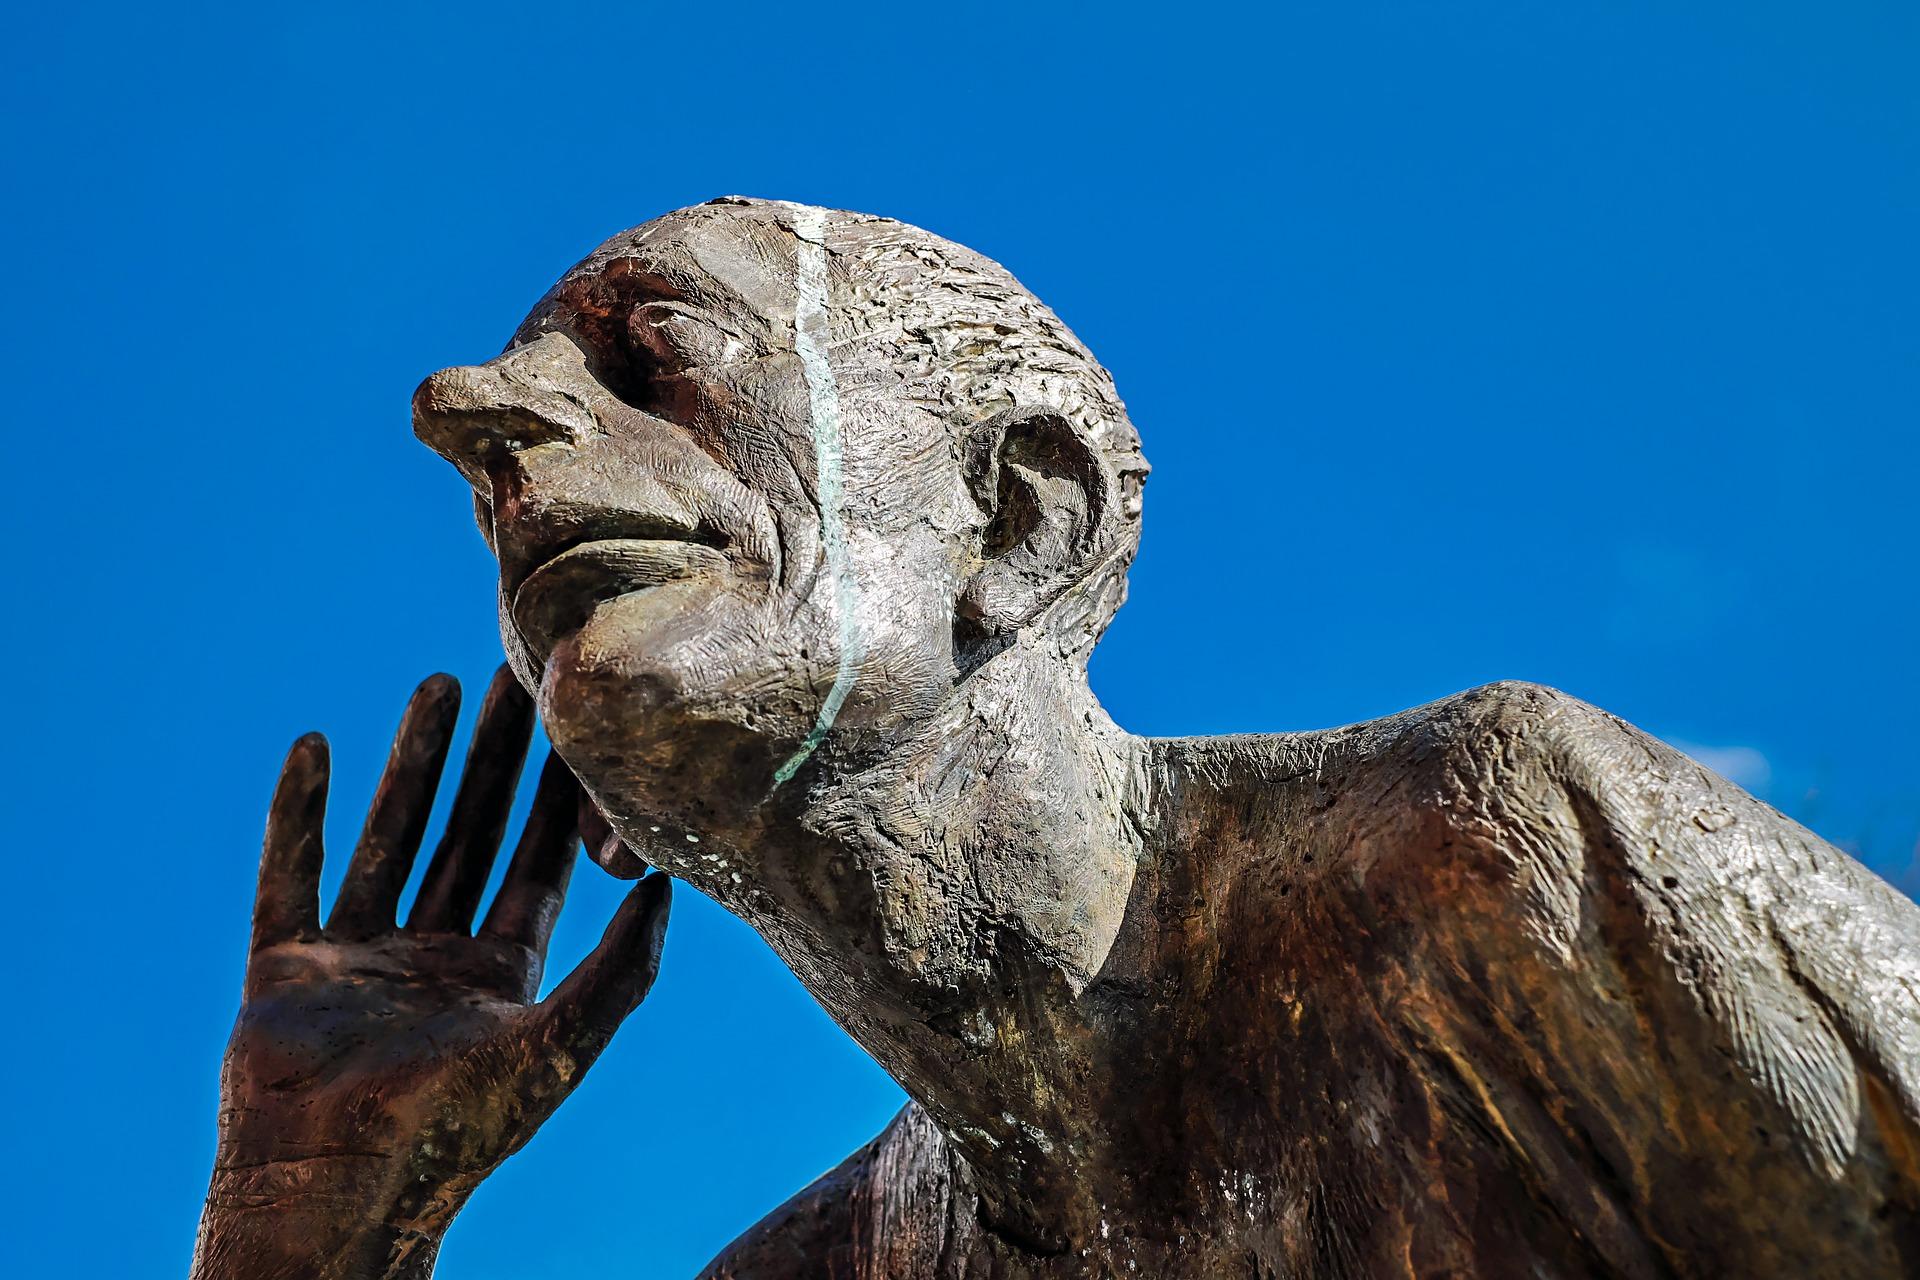 sculpture-3365574_1920